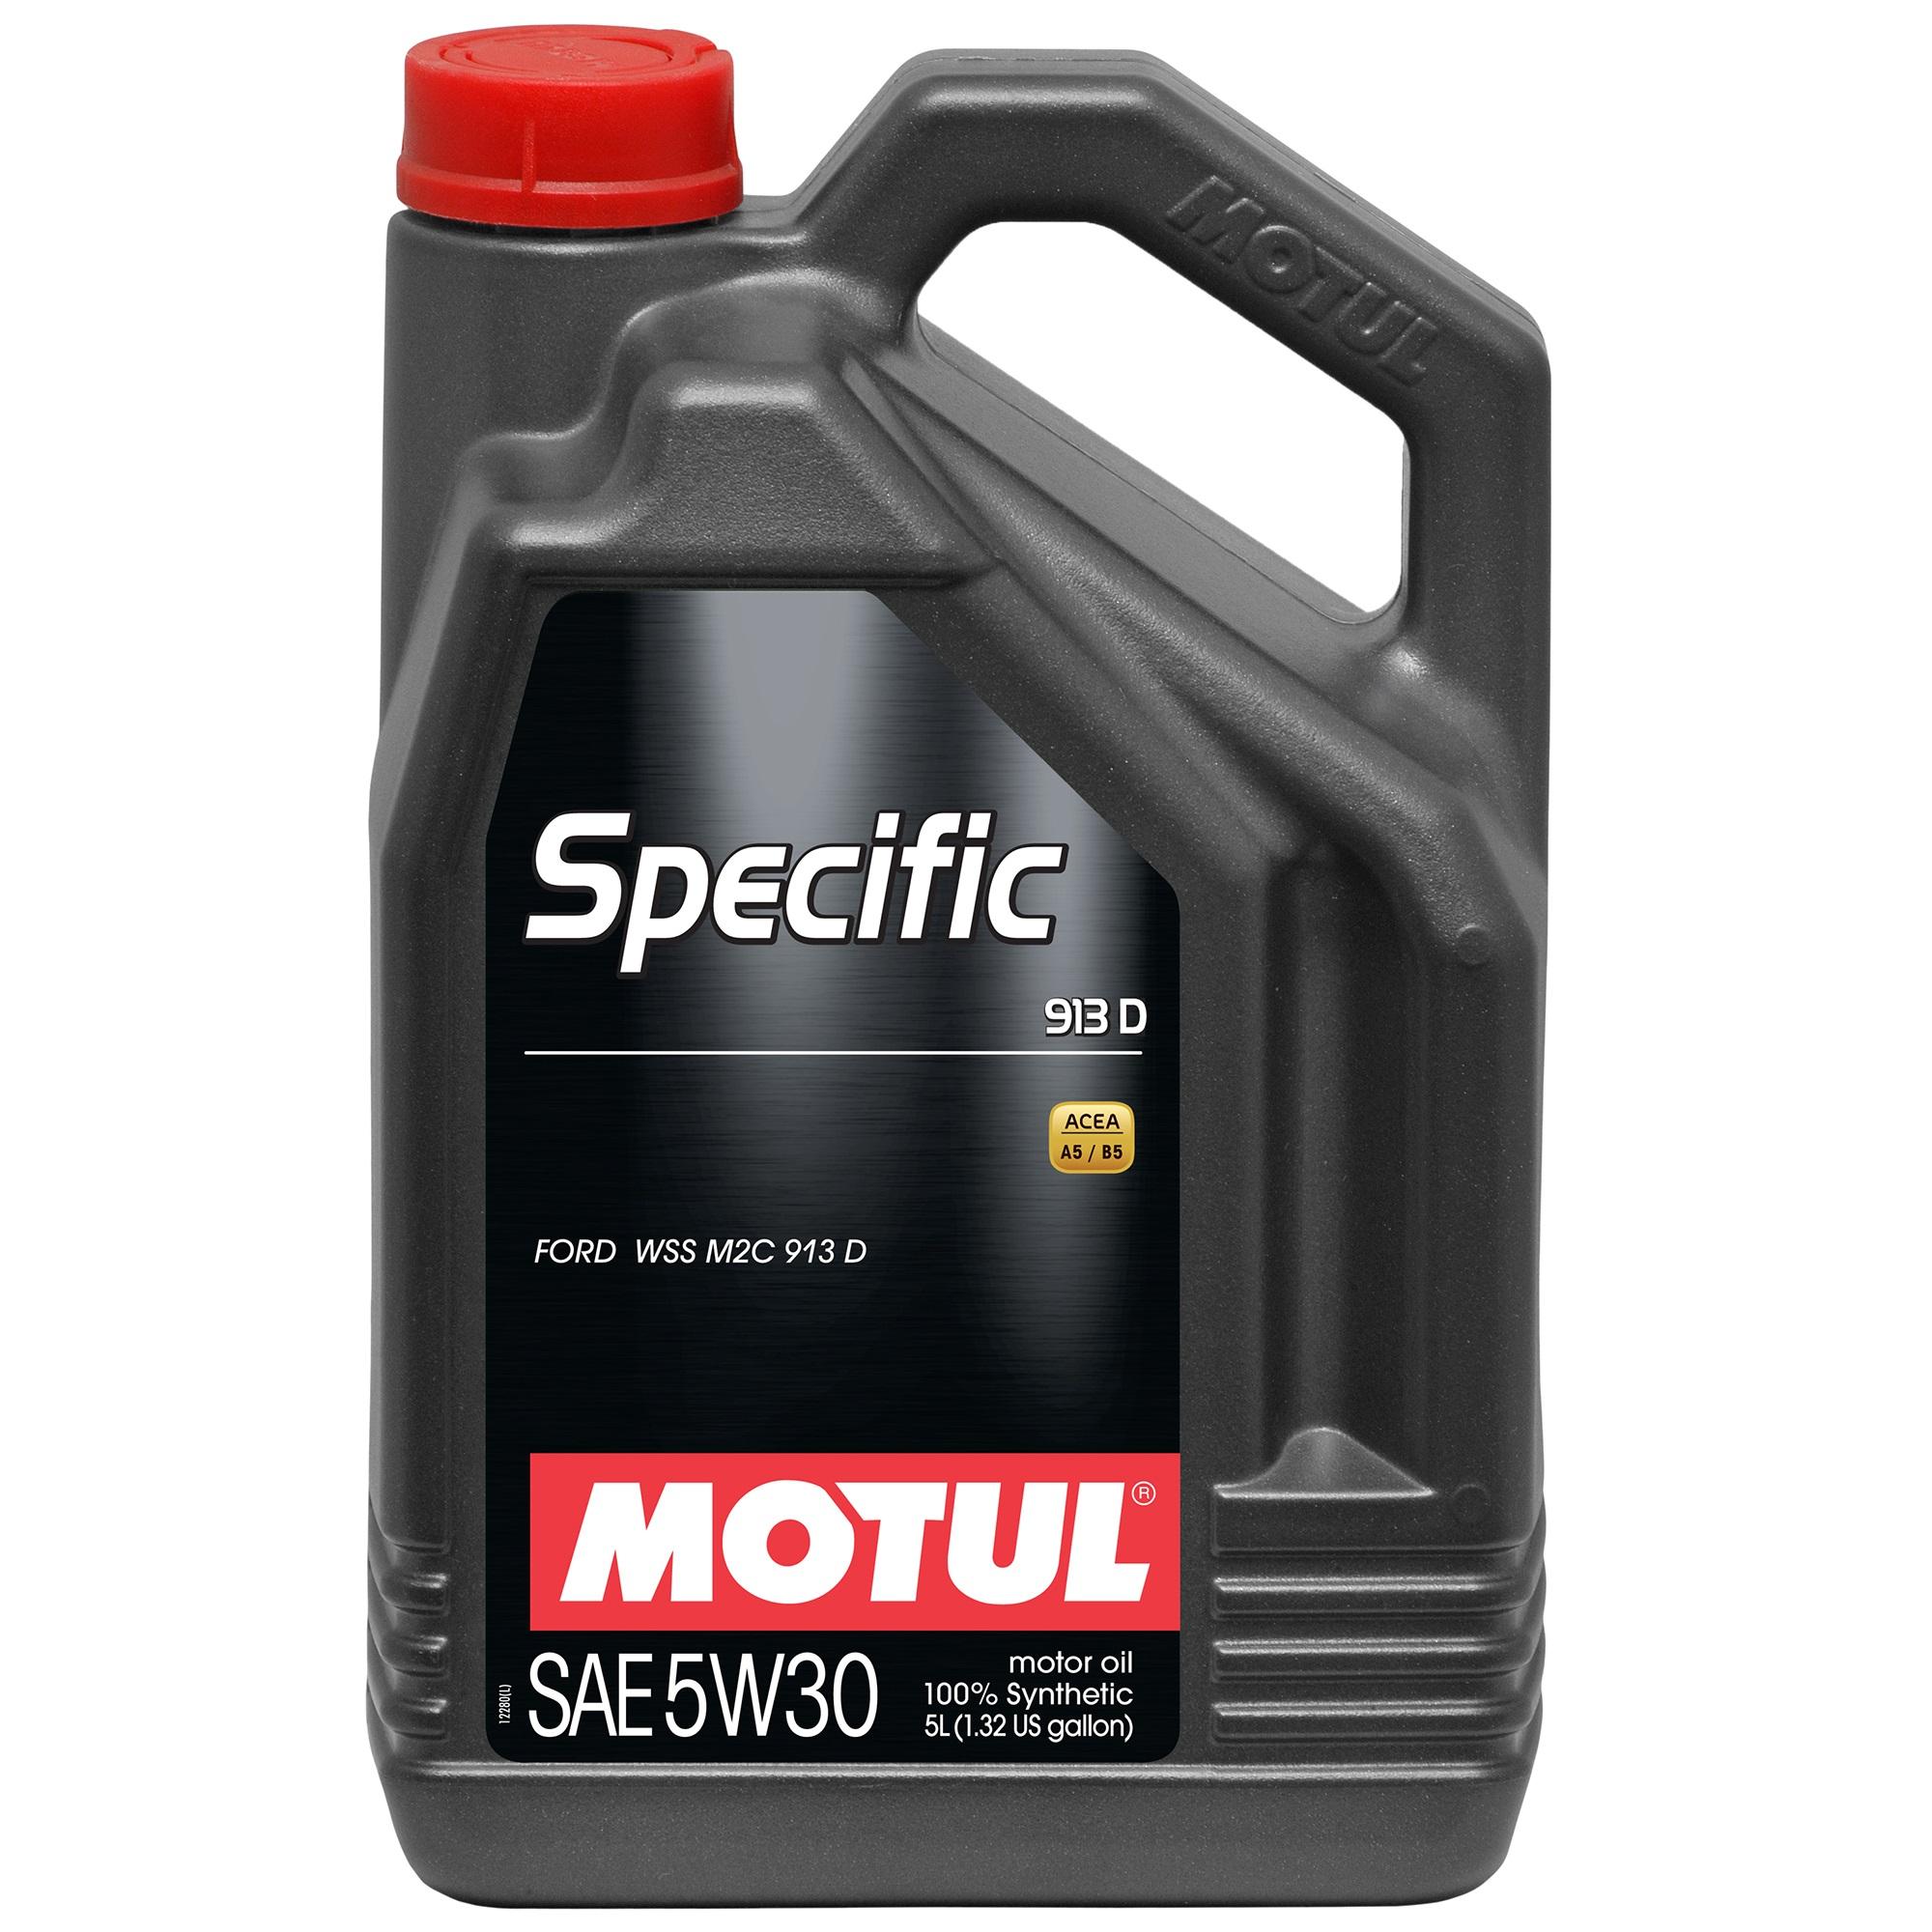 ULEI MOTOR MOTUL SPECIFIC FORD 913 D 5W30 5L